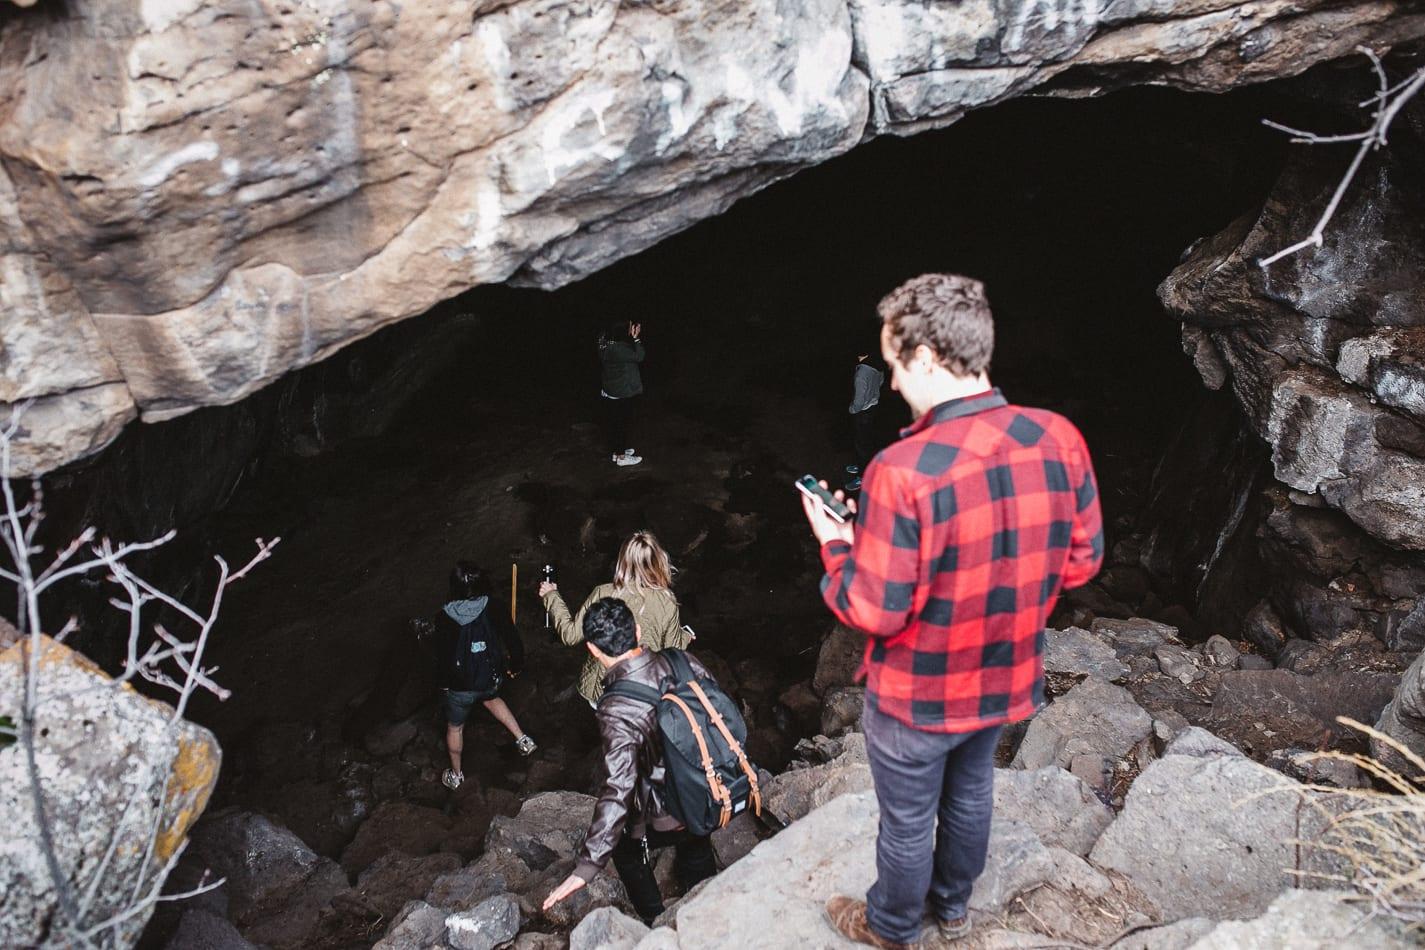 pluto-cave-mount-shasta-lifestyle-portrati-photo-18